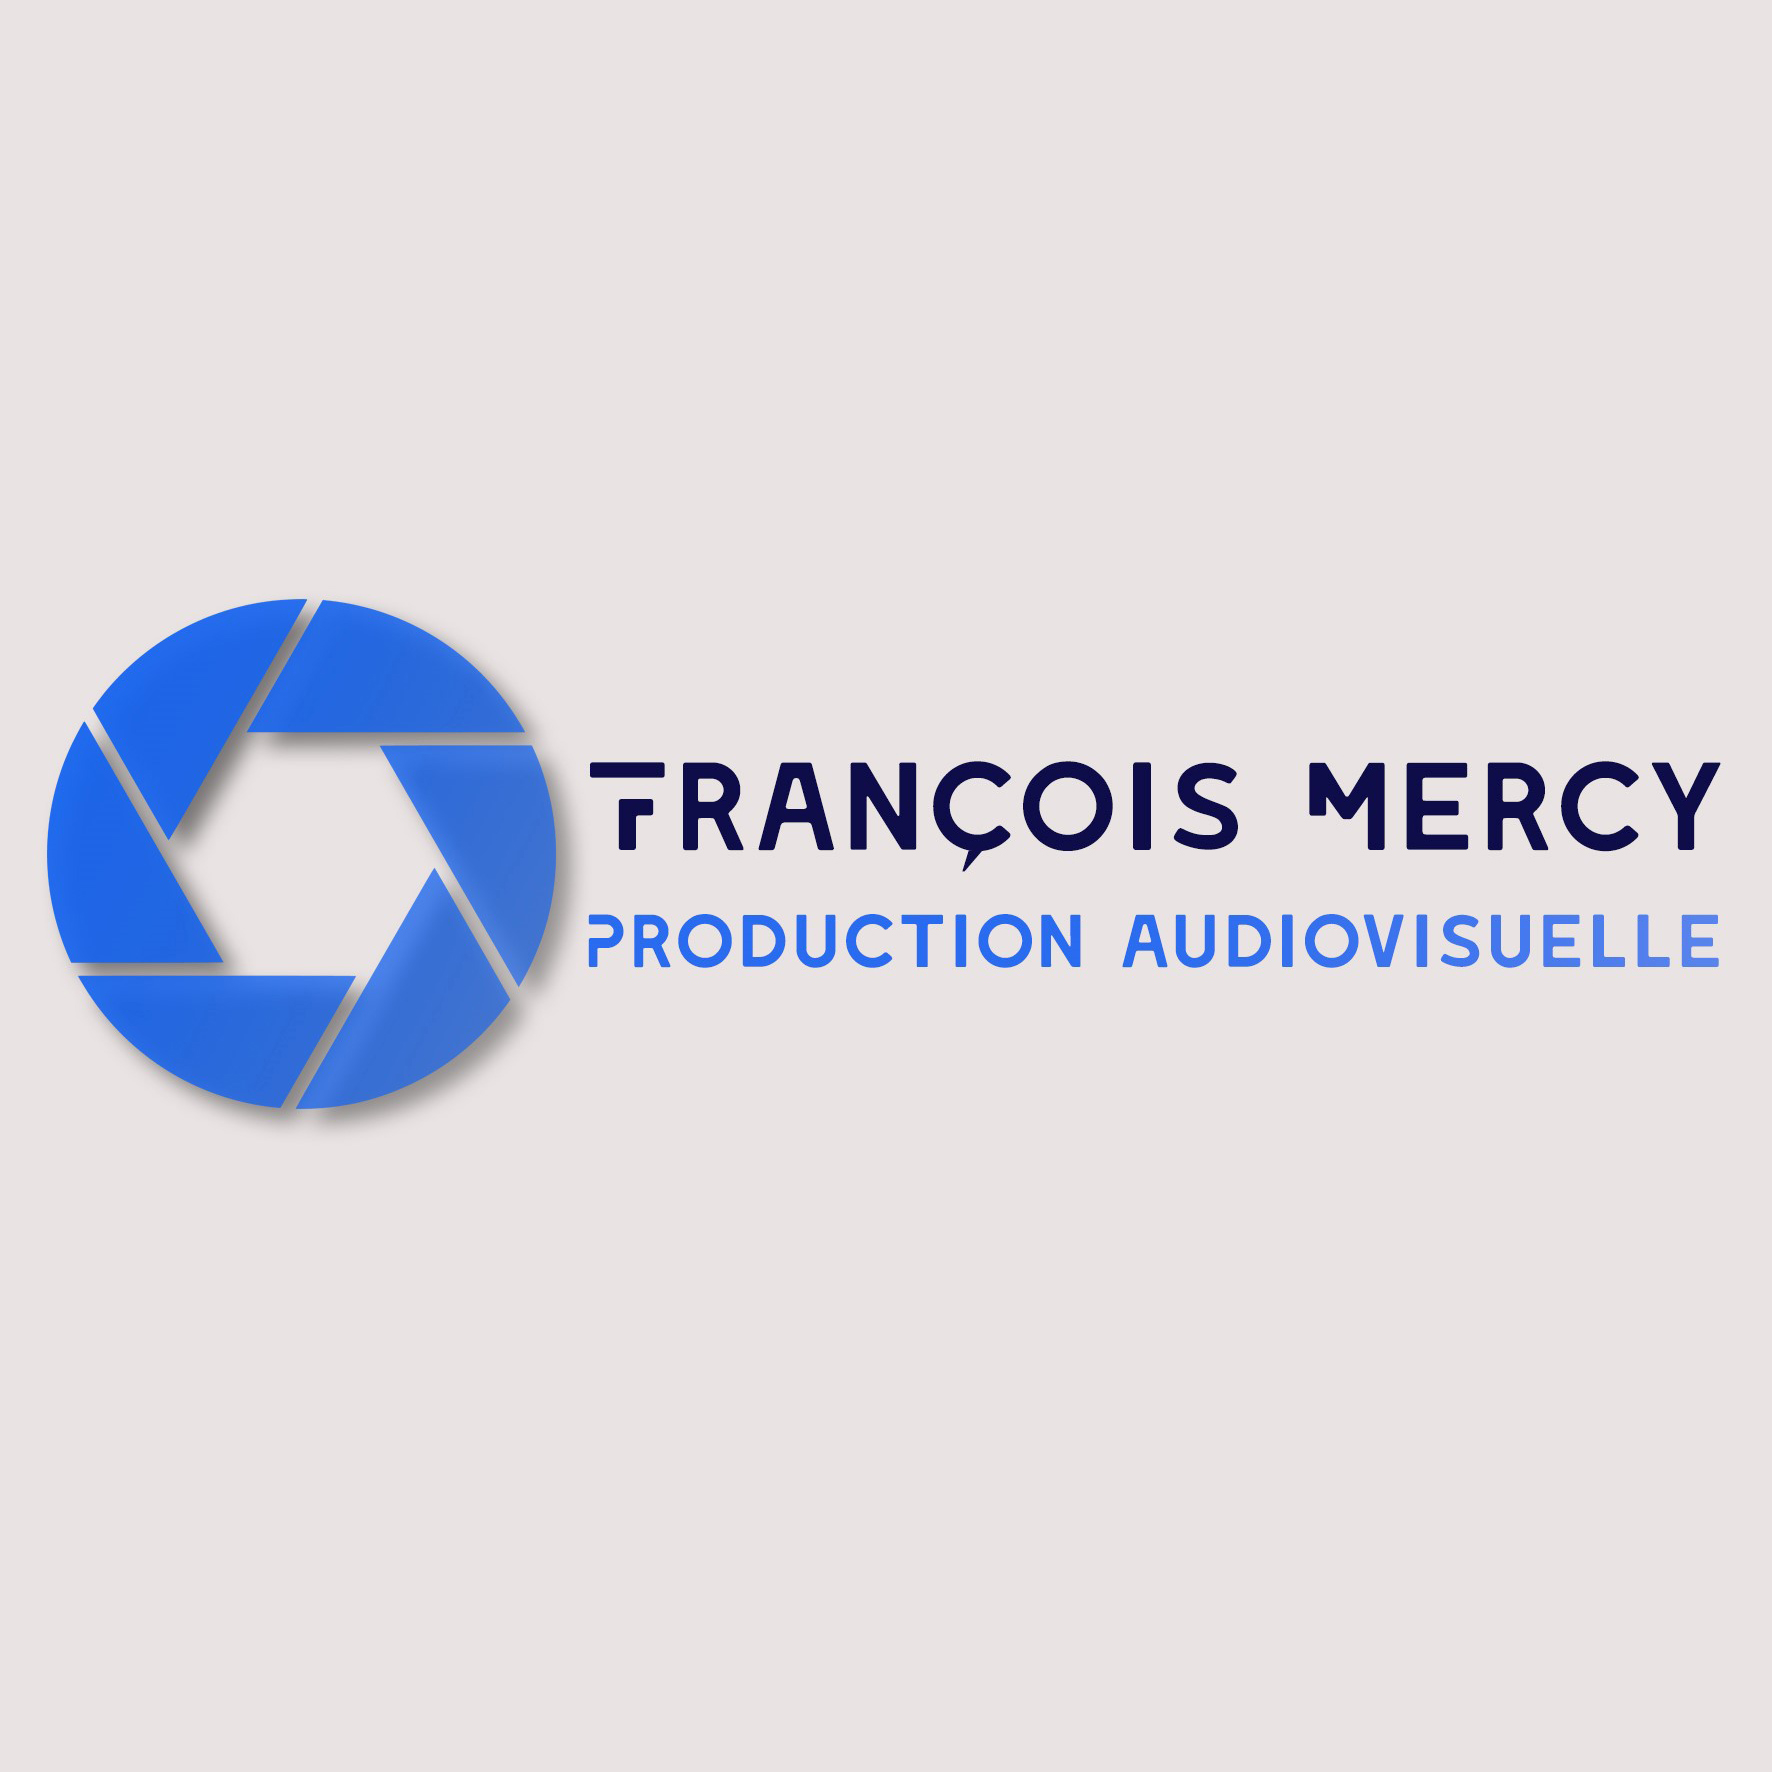 francois mercy